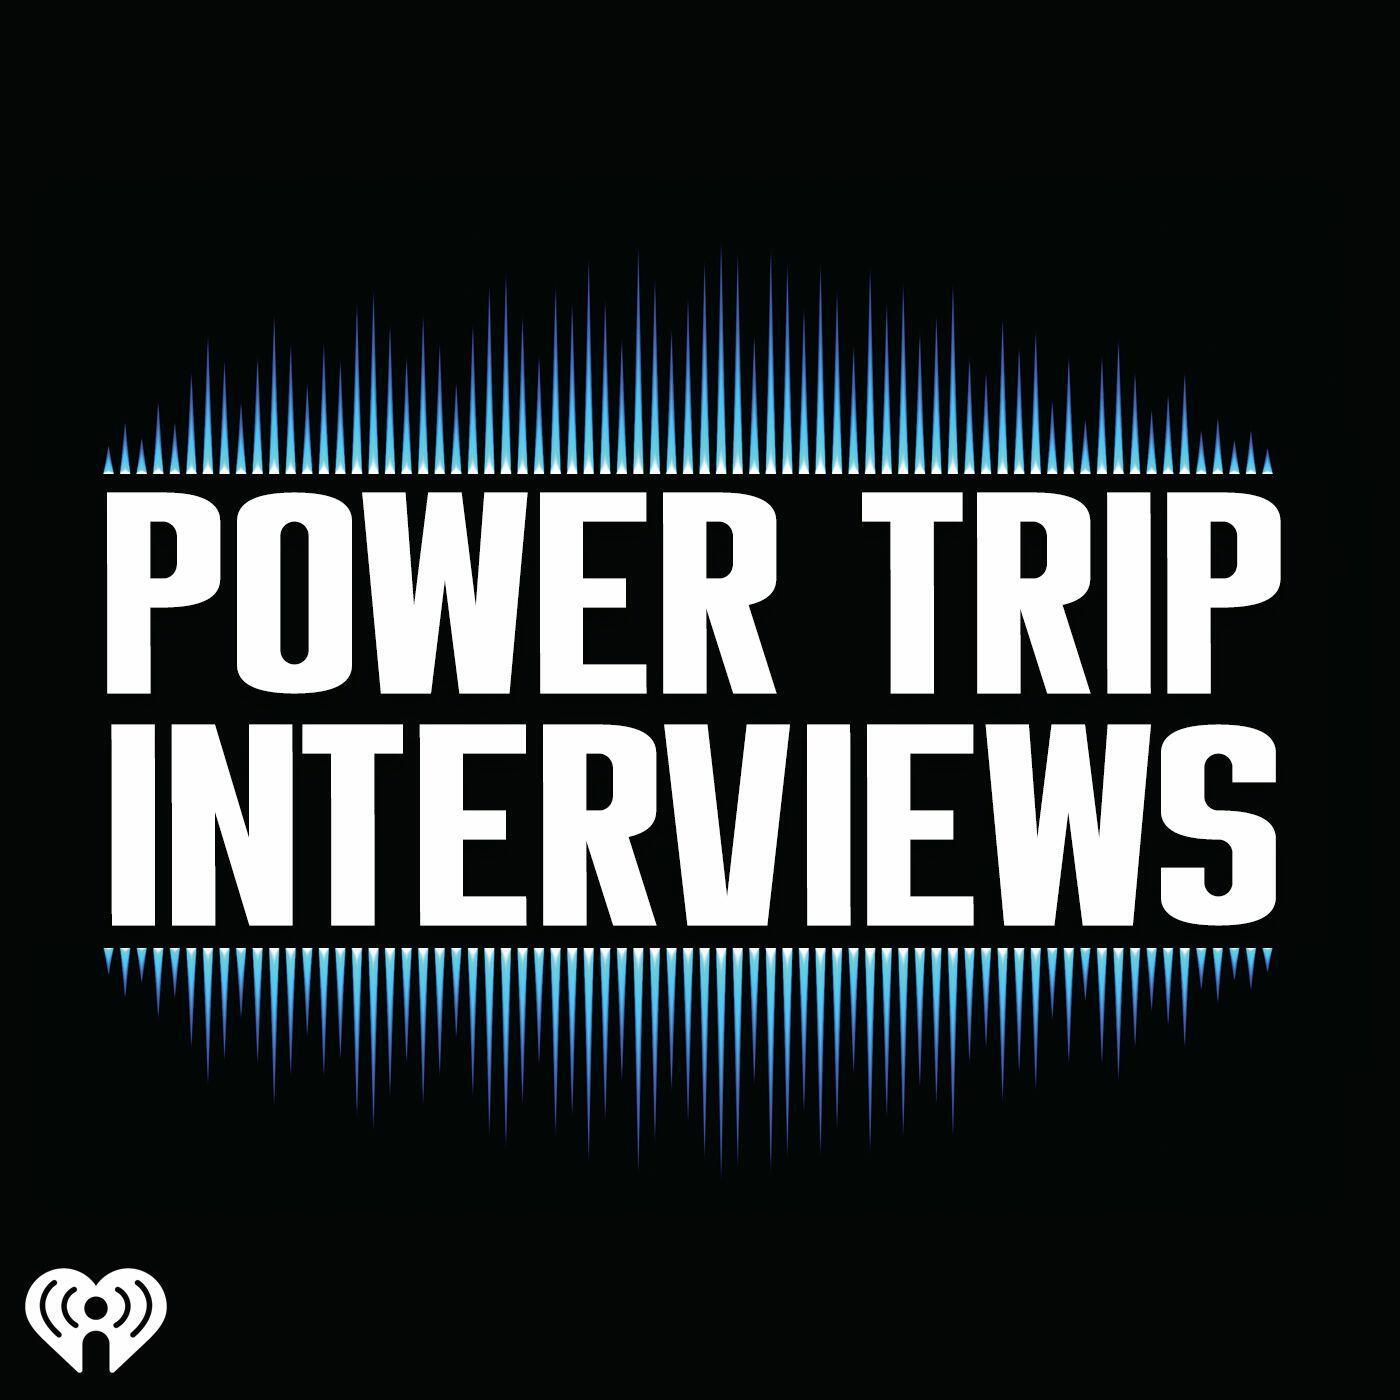 The Power Trip Interviews